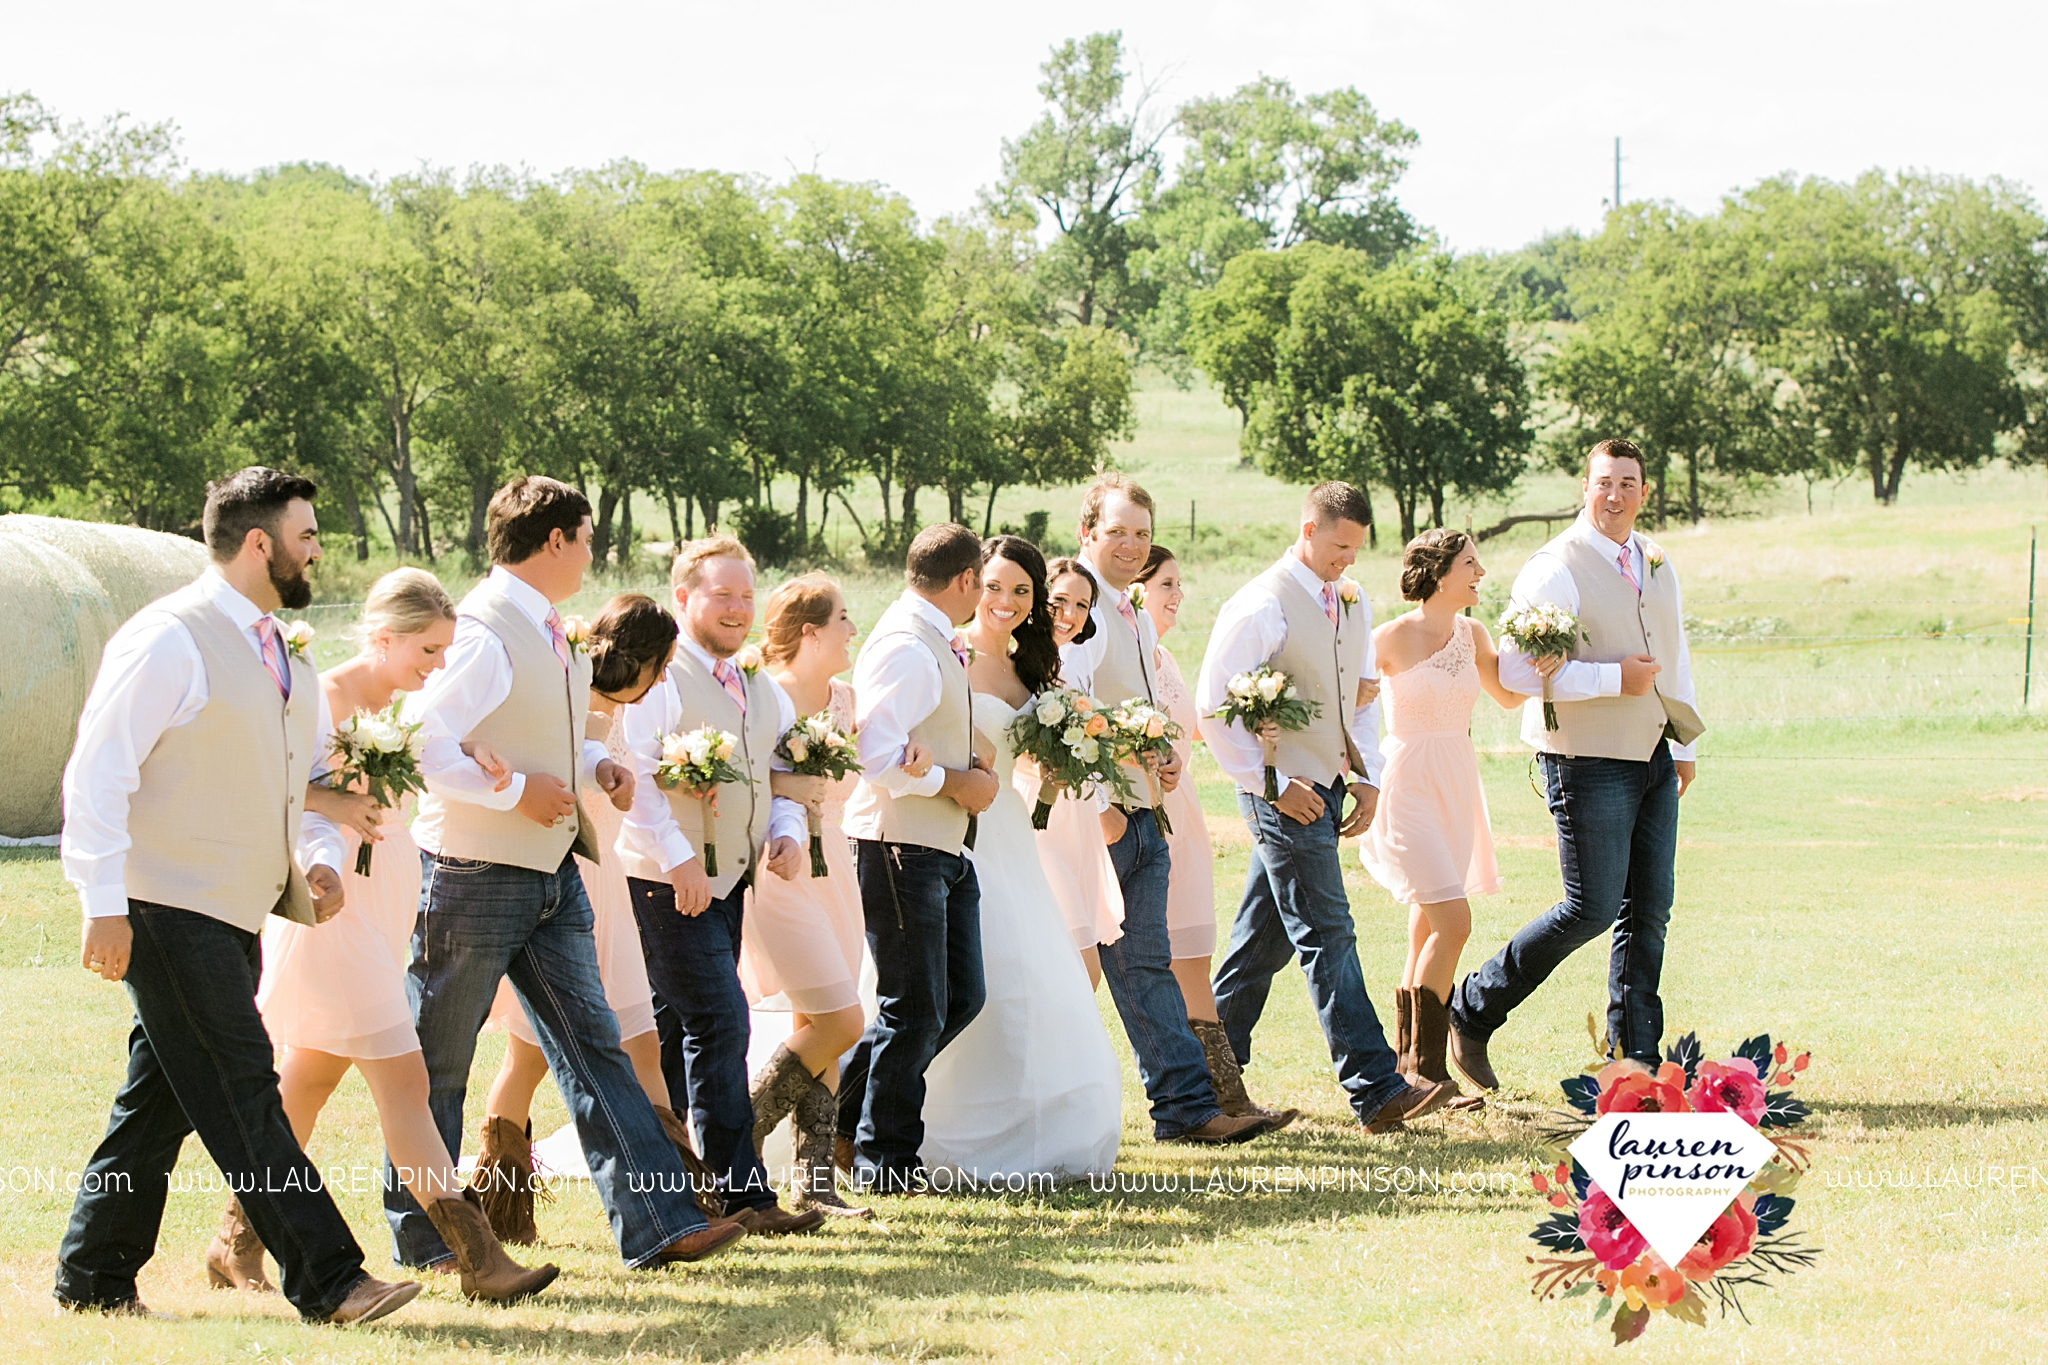 jones-barn-willow-creek-ranch-wedding-in-cleburne-texas-fort-worth-dfw-wichita-falls-wedding-photography_3221.jpg